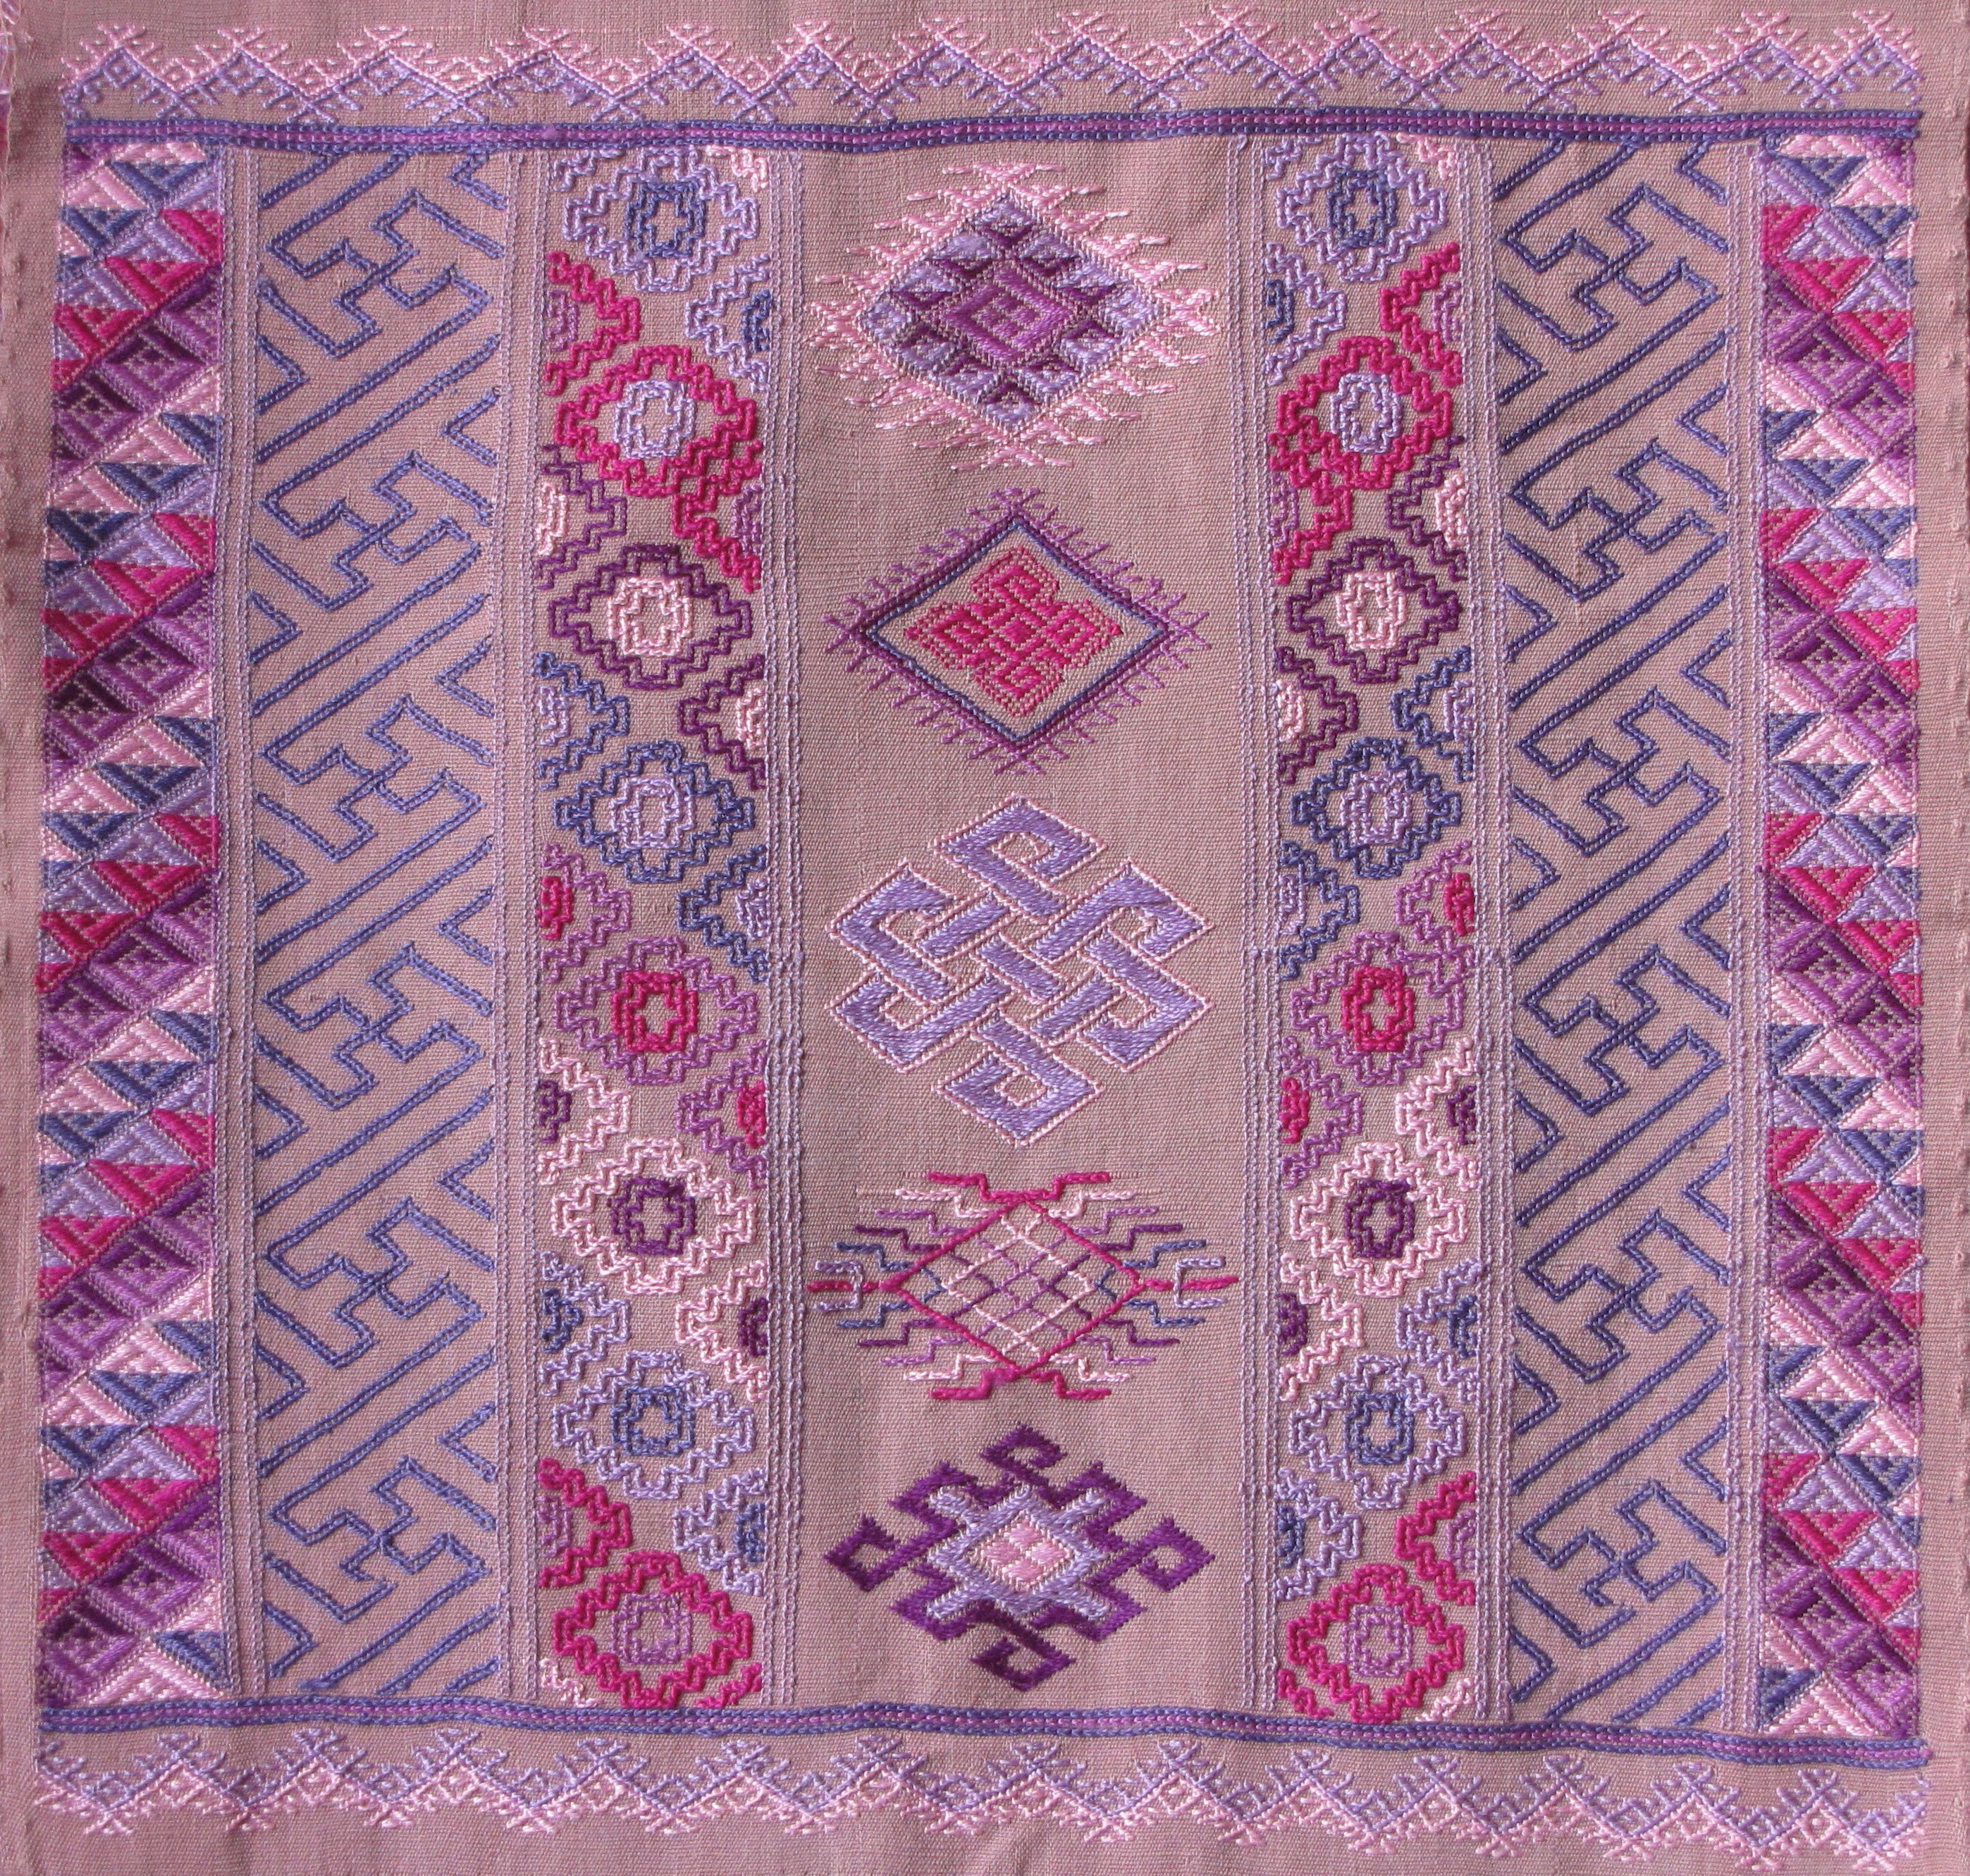 dhaka cloth patterns - Google Search